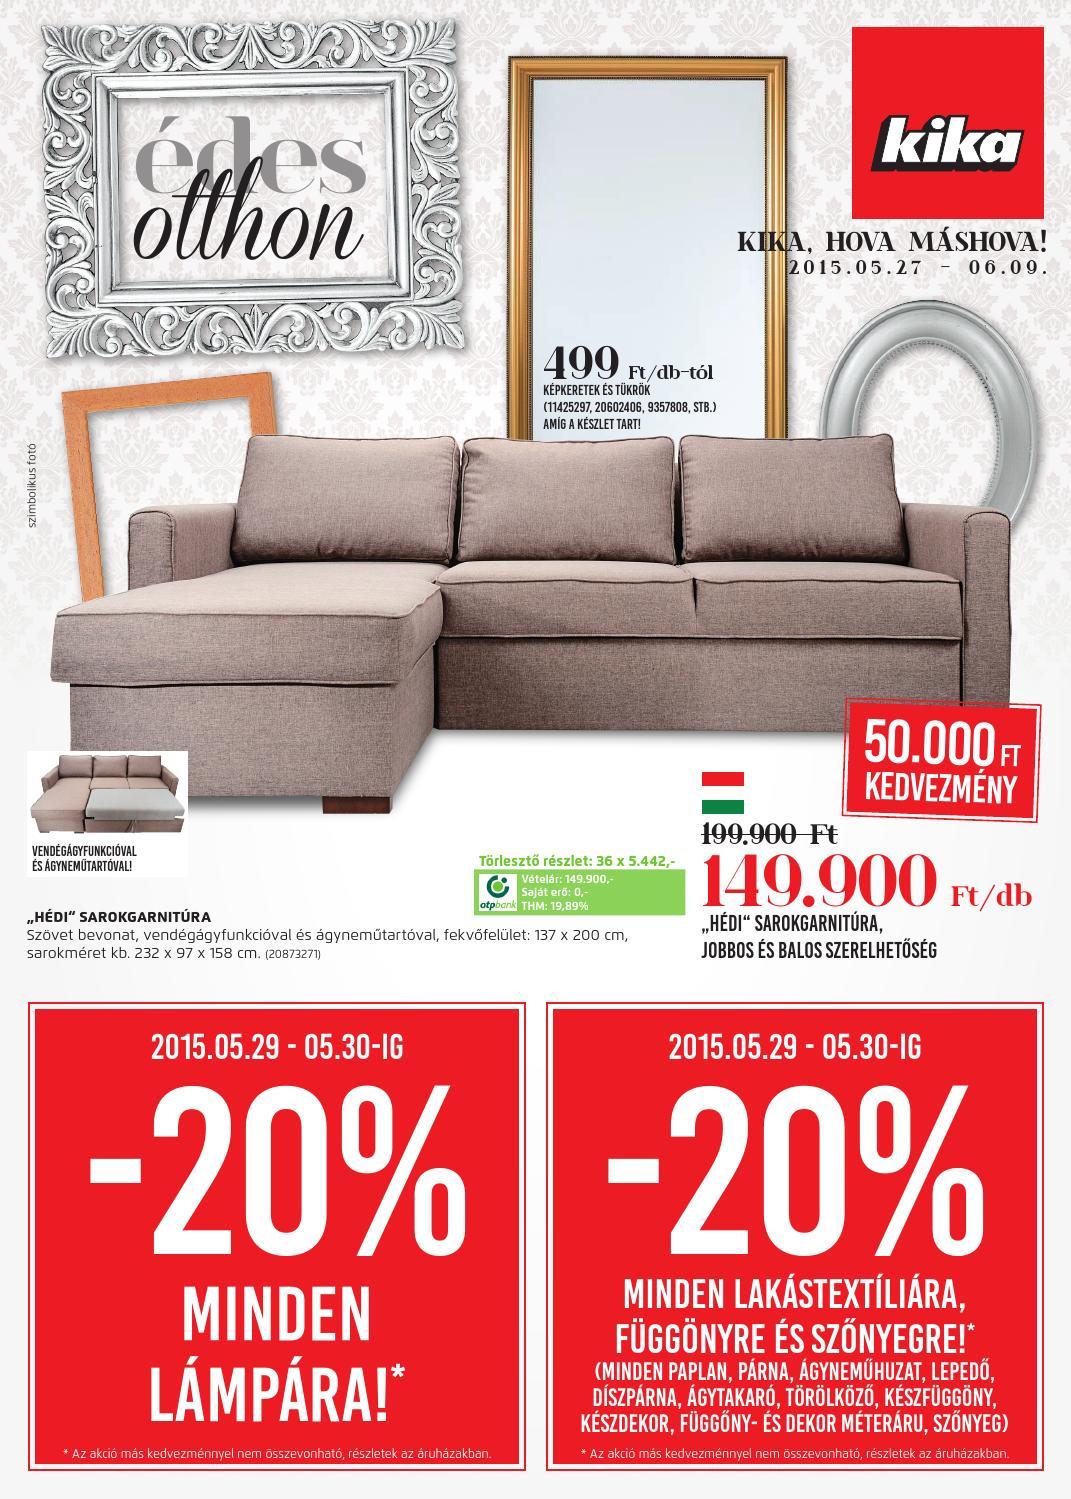 kika lakberendez s akci s sz r lap hu30 by kika home furnishing issuu. Black Bedroom Furniture Sets. Home Design Ideas